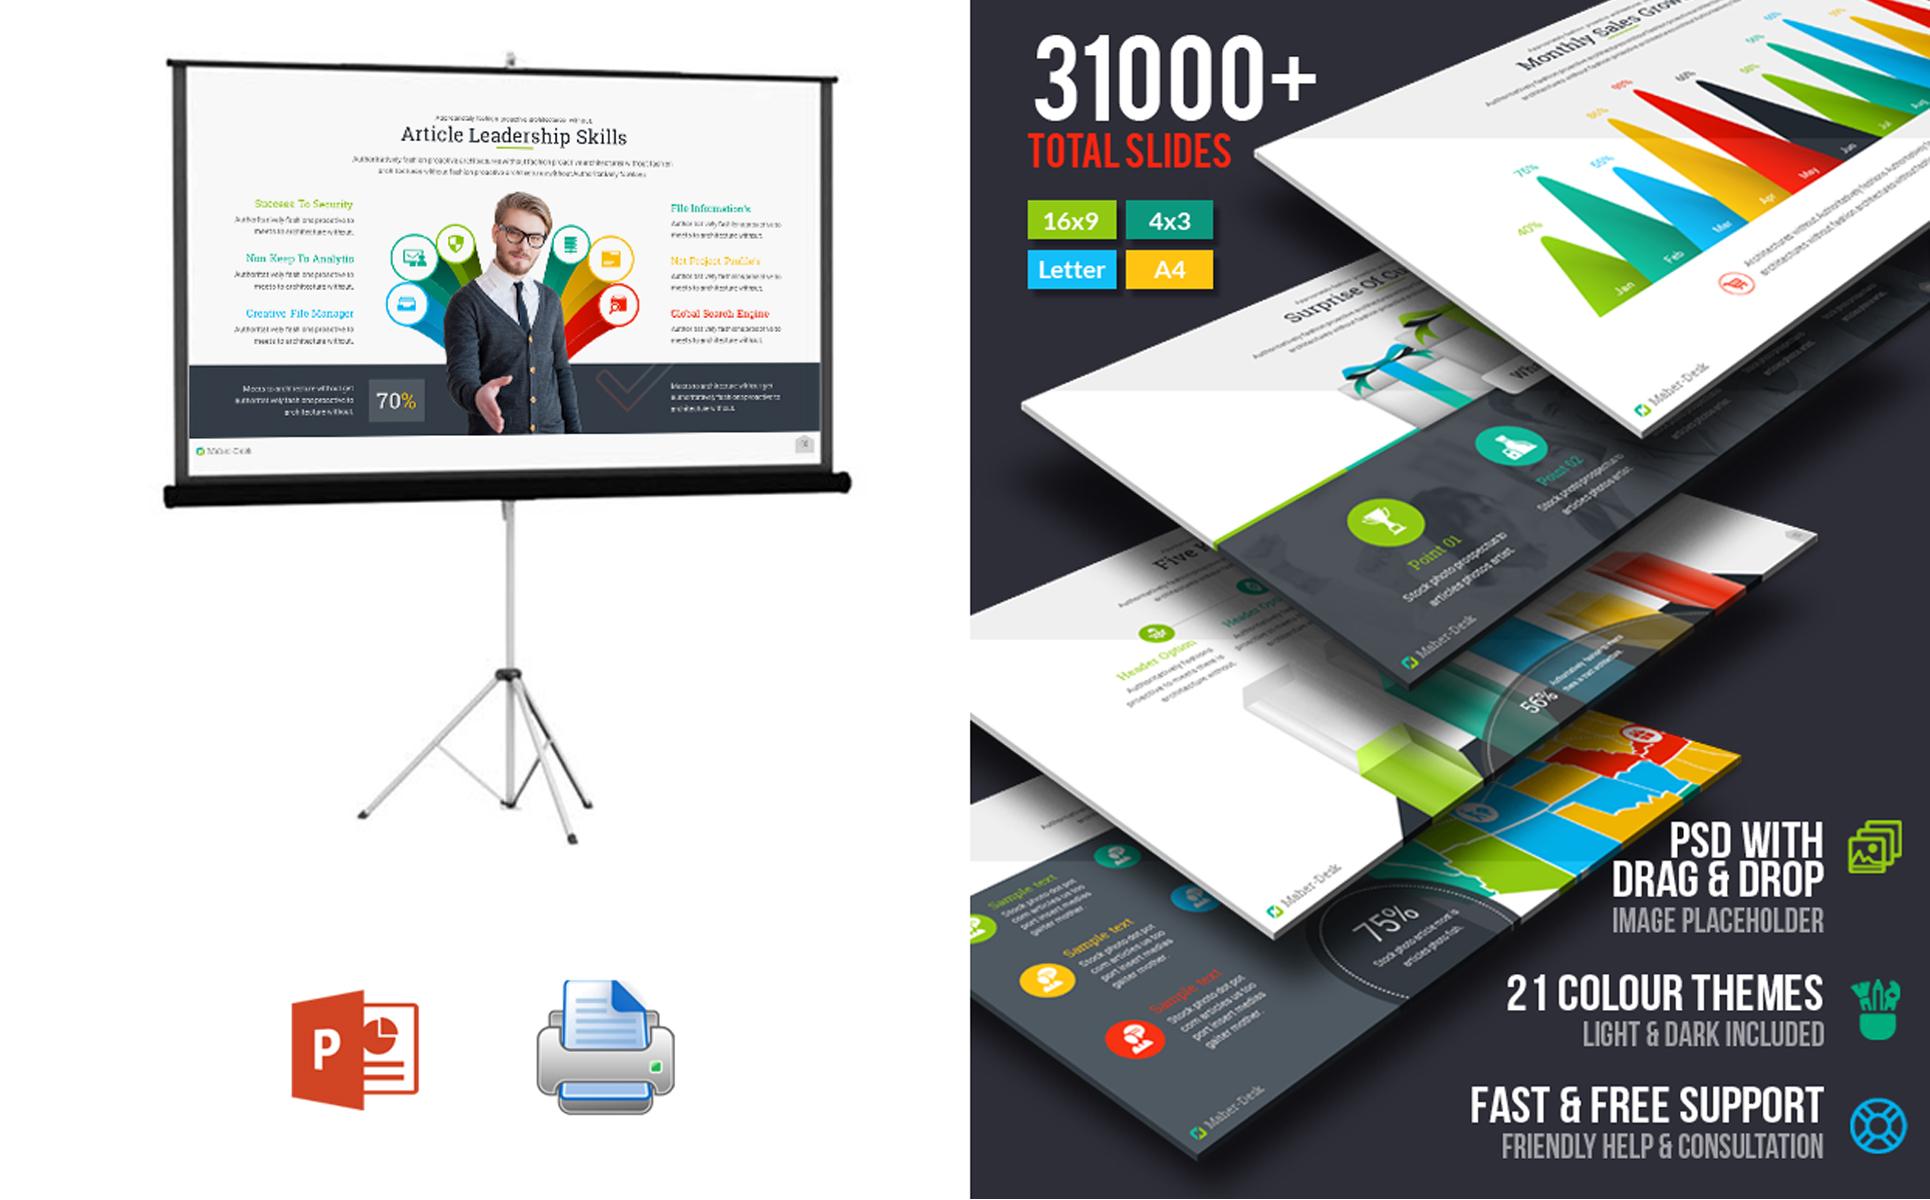 Maher desk business plan powerpoint template 67731 zoom in toneelgroepblik Choice Image